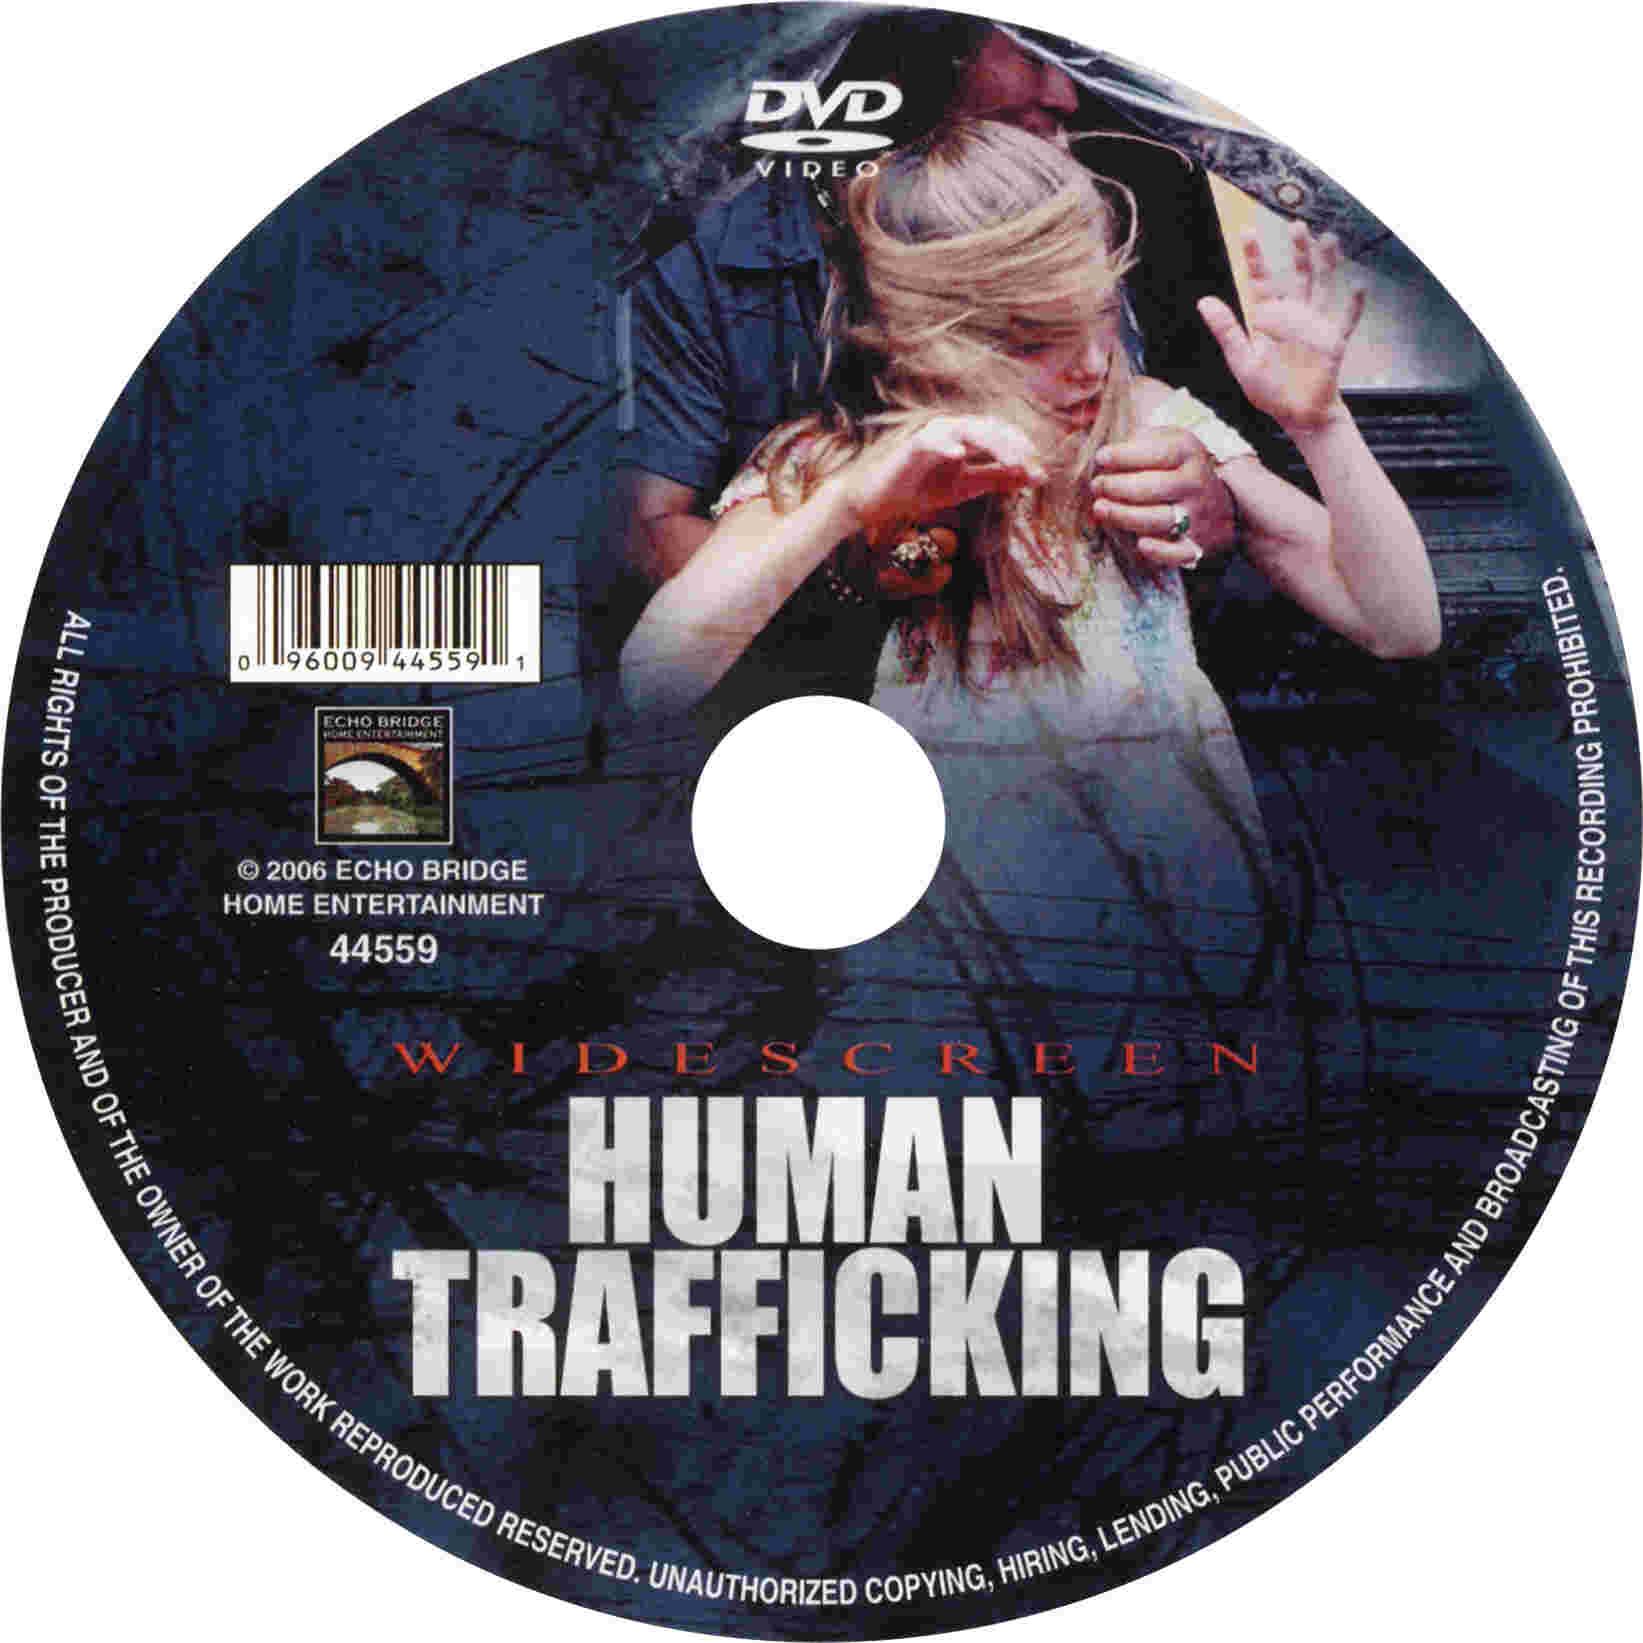 coversboxsk human trafficking high quality dvd